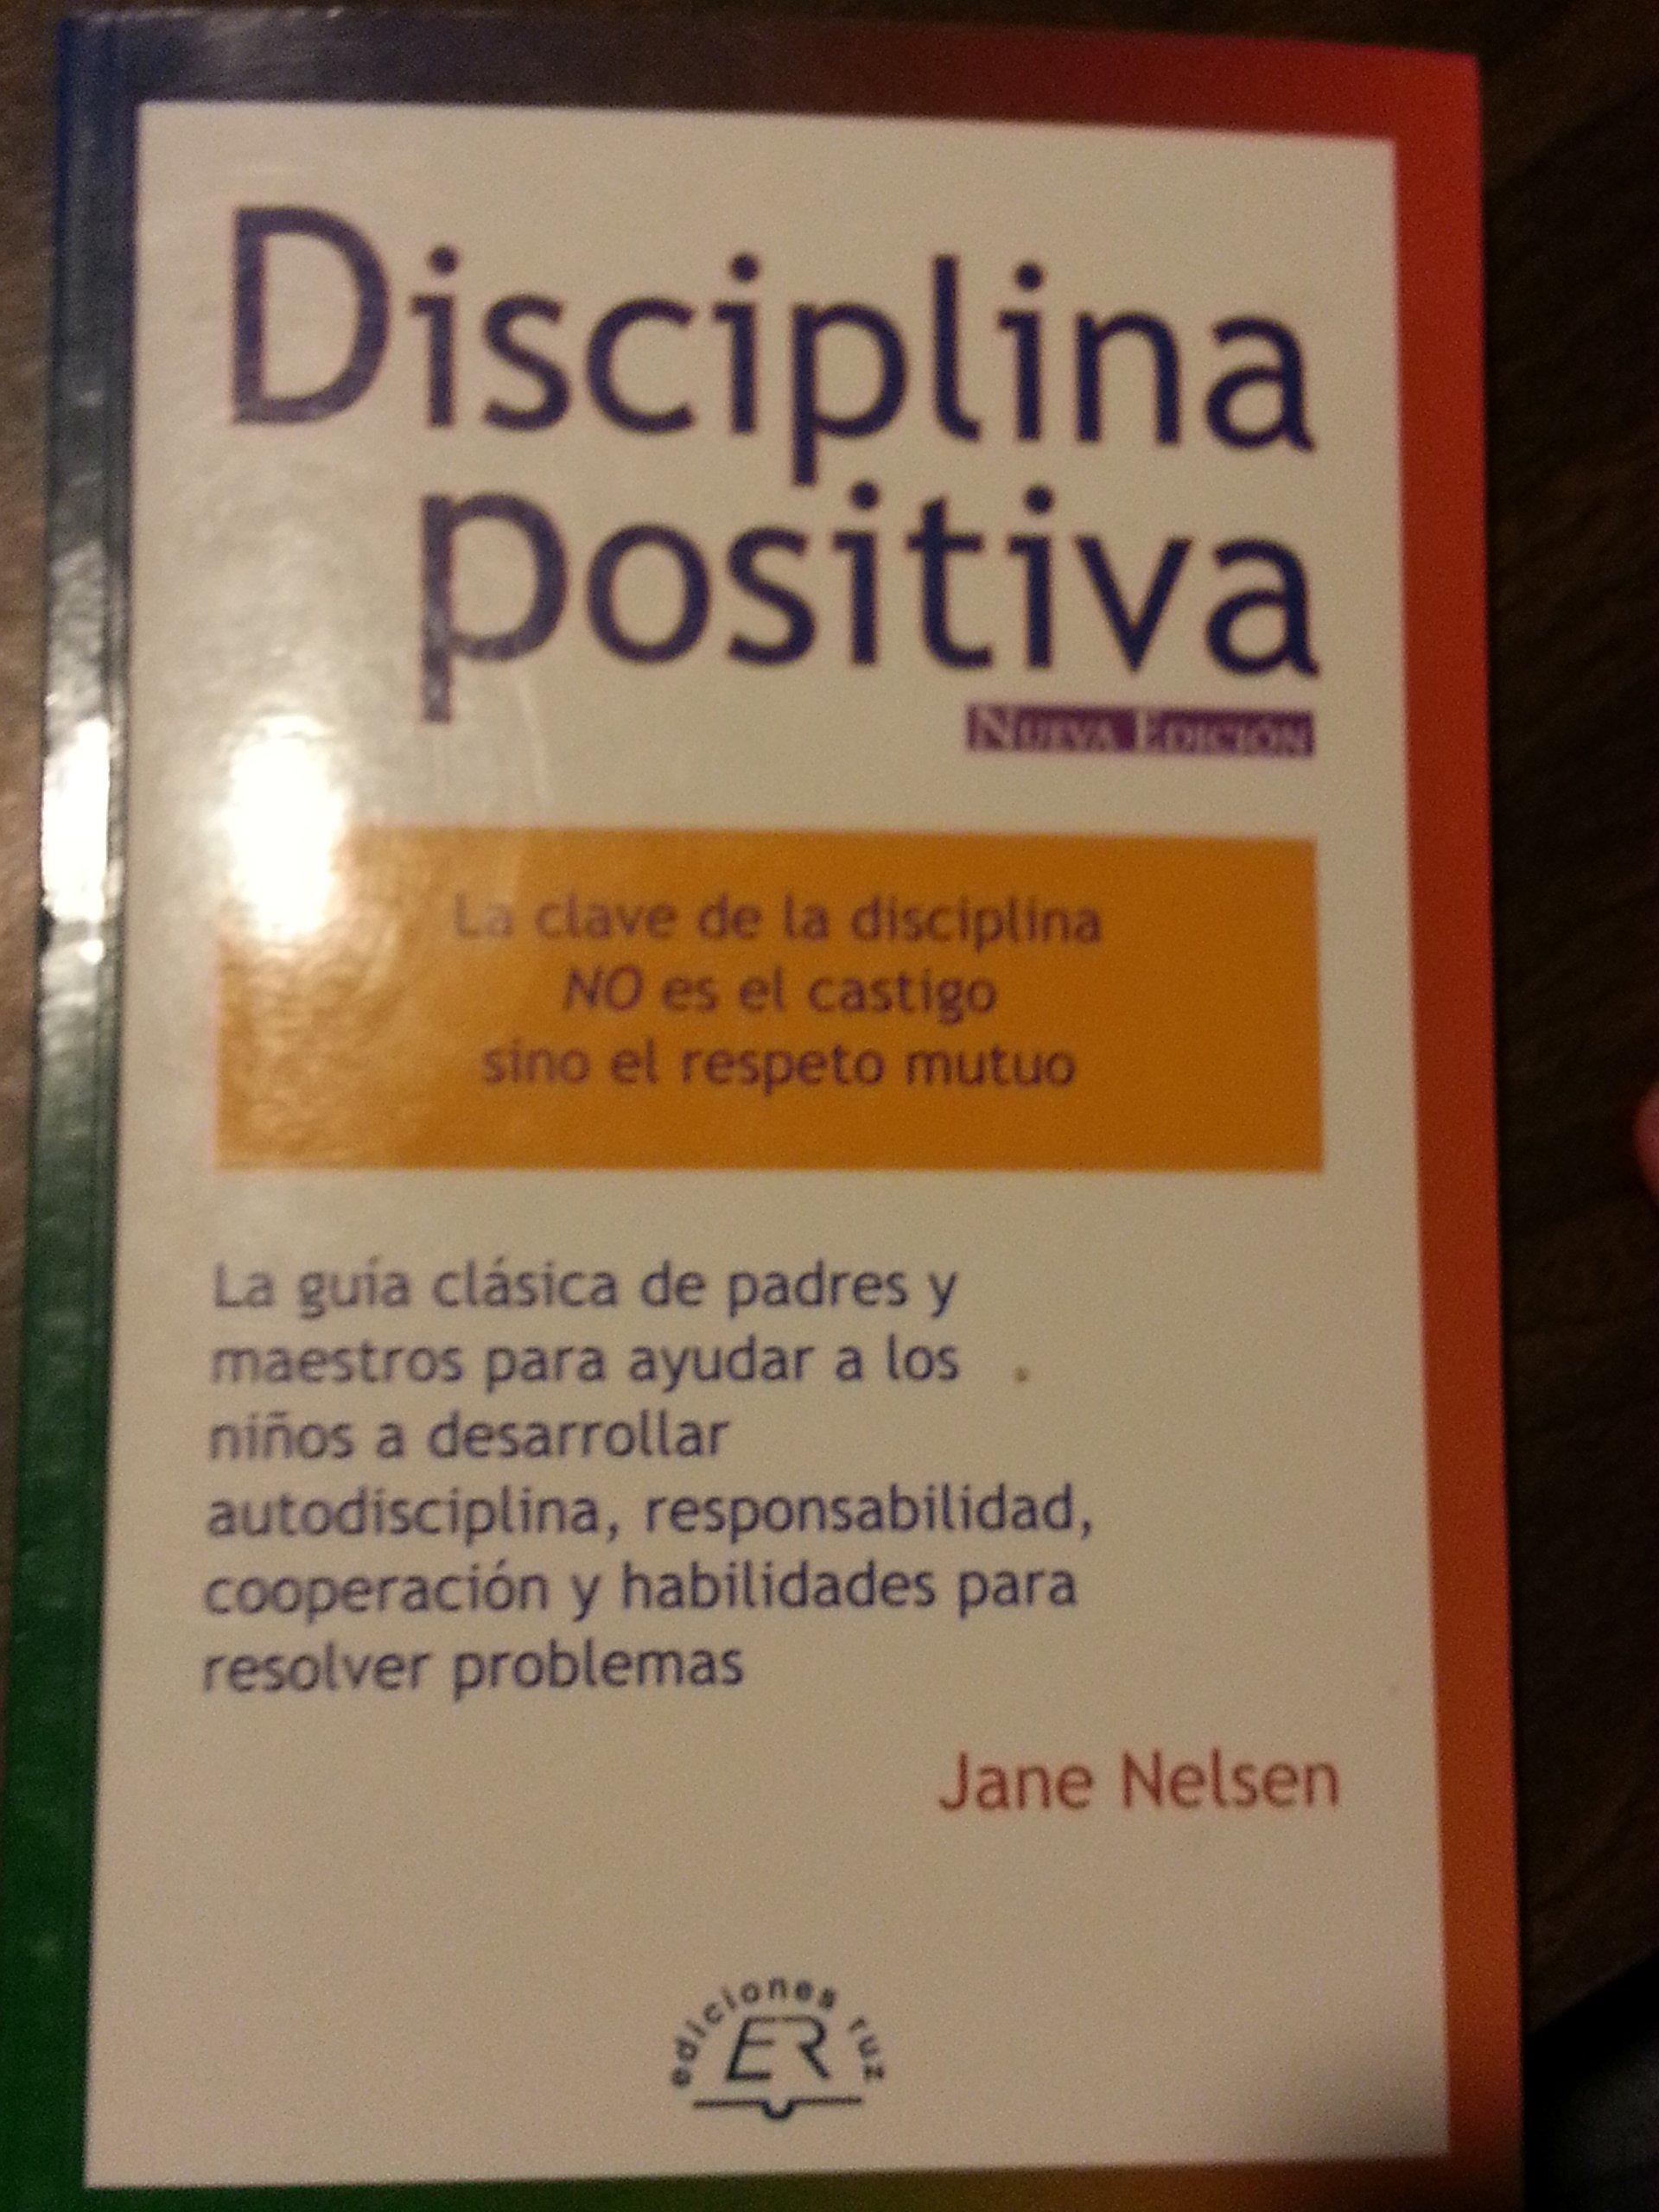 Disciplina Positiva Para Padres: Amazon.es: Jane Nelsen: Libros